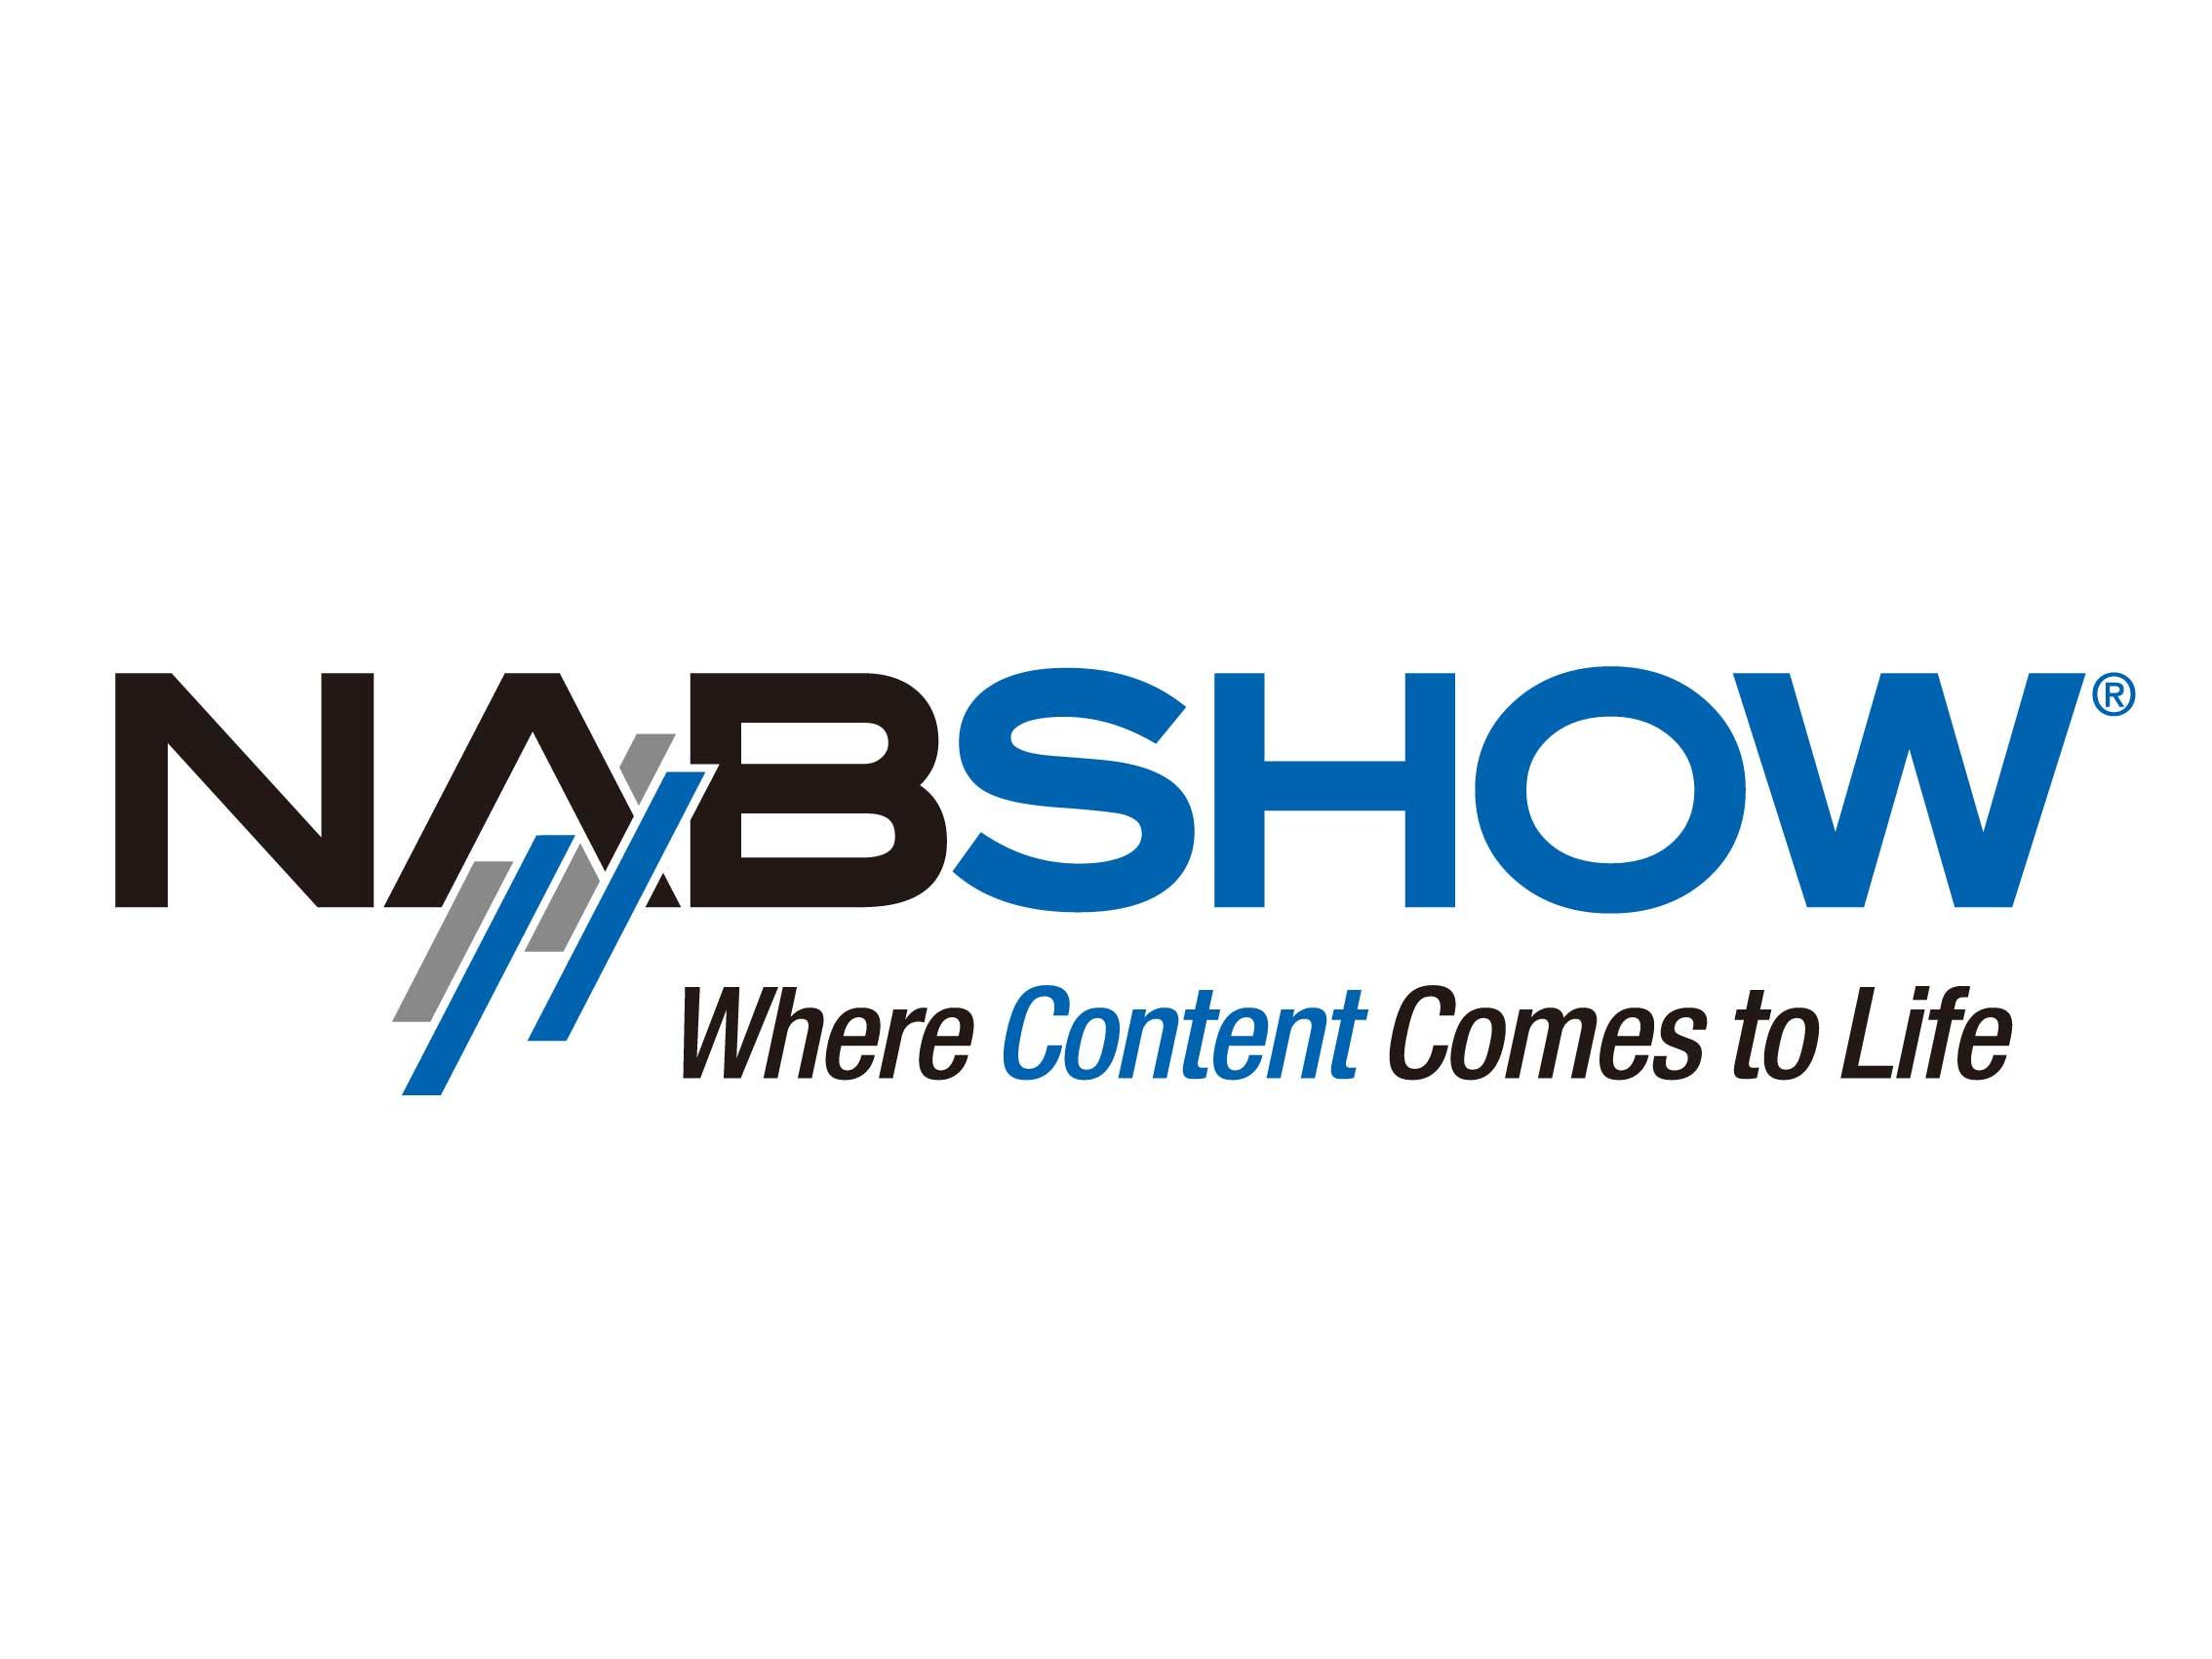 NABSHOW_2019